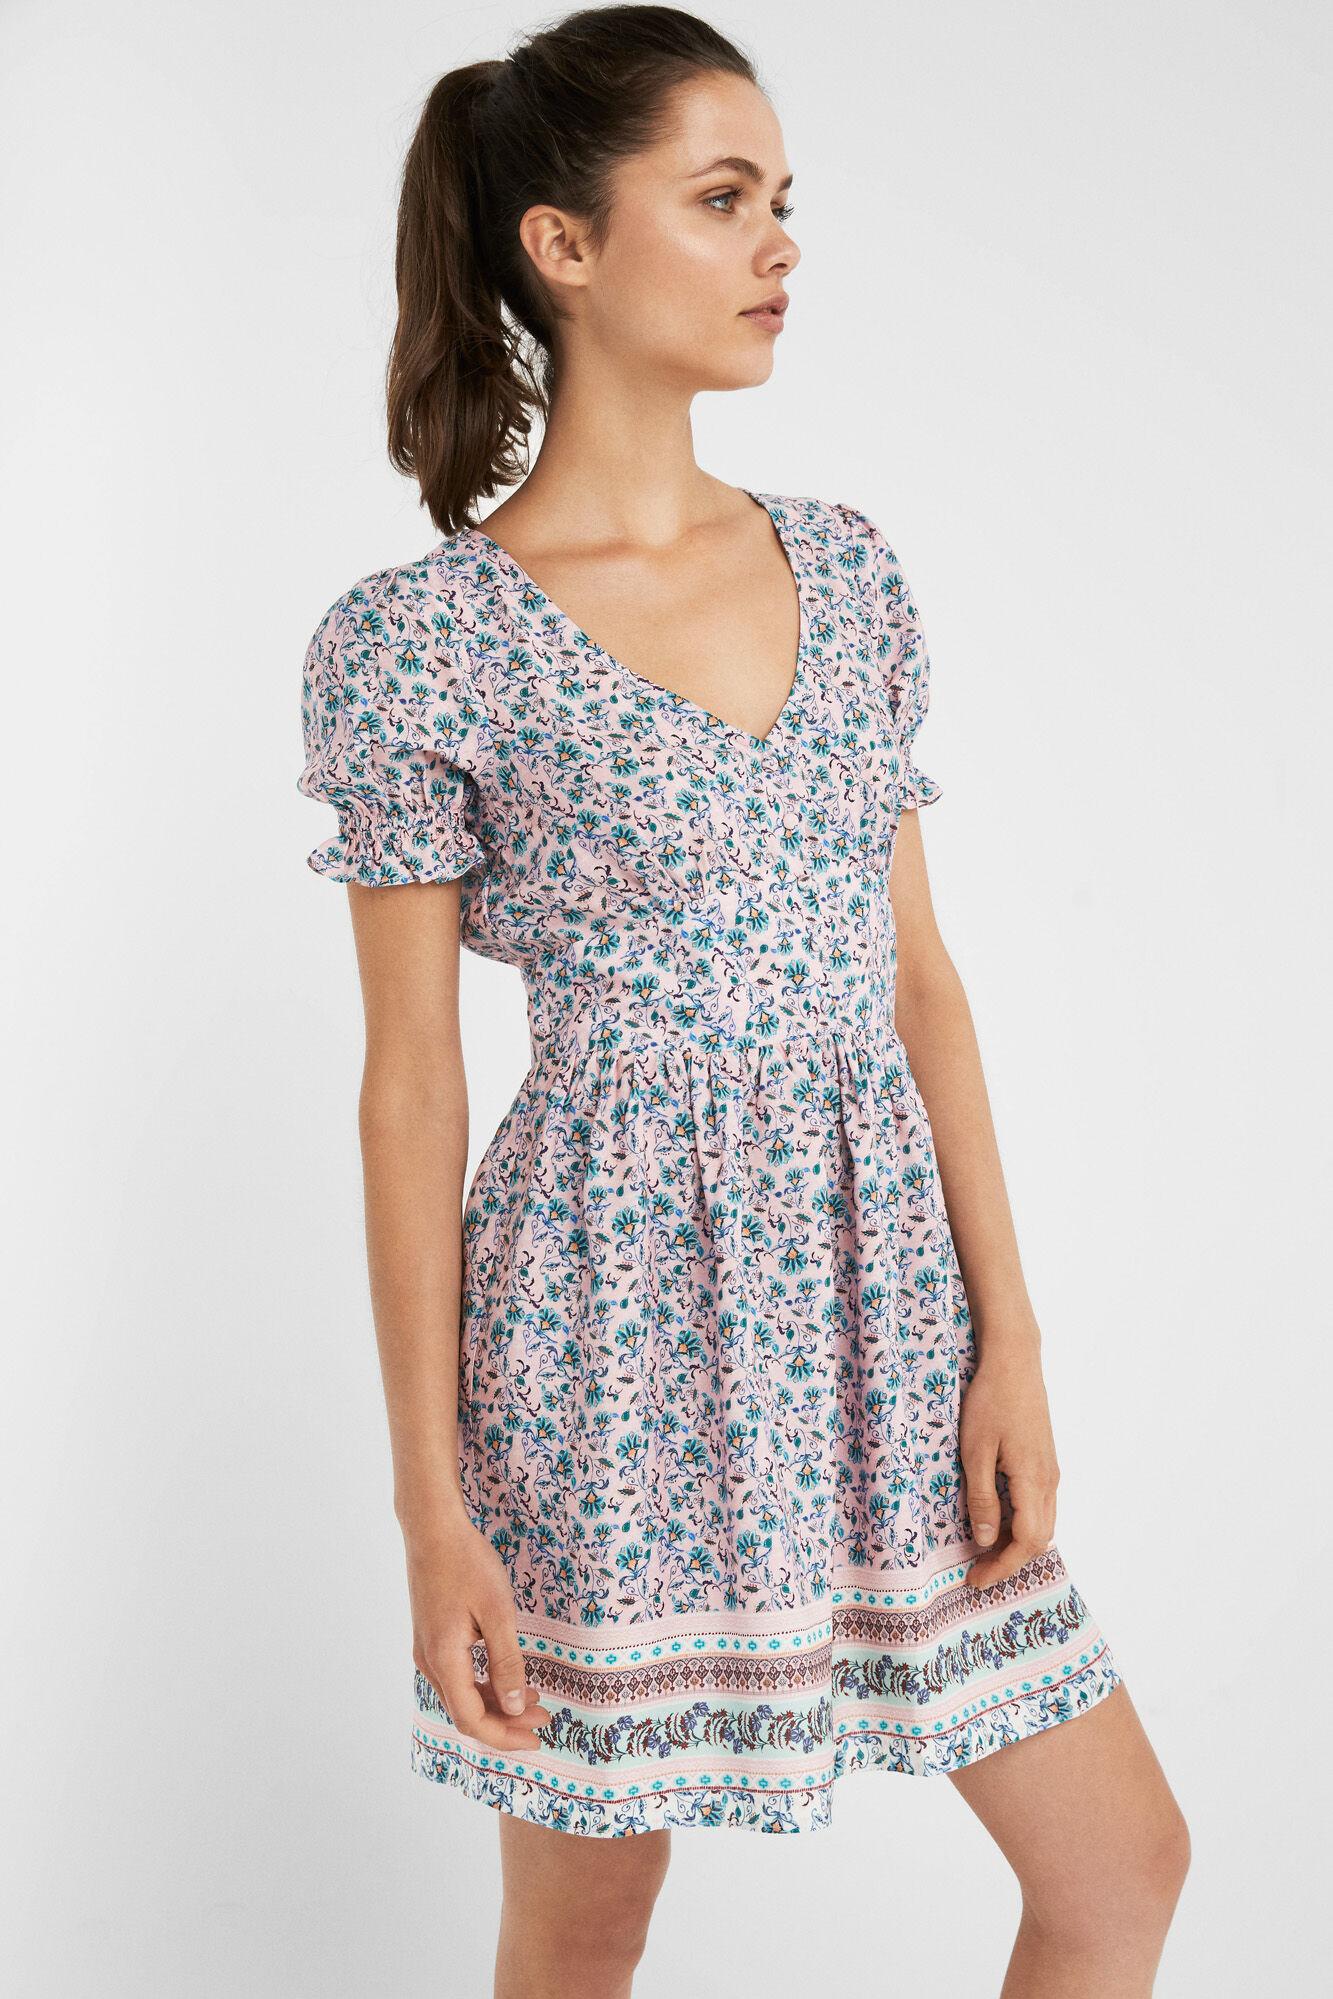 Como combinar un vestido azul con flores